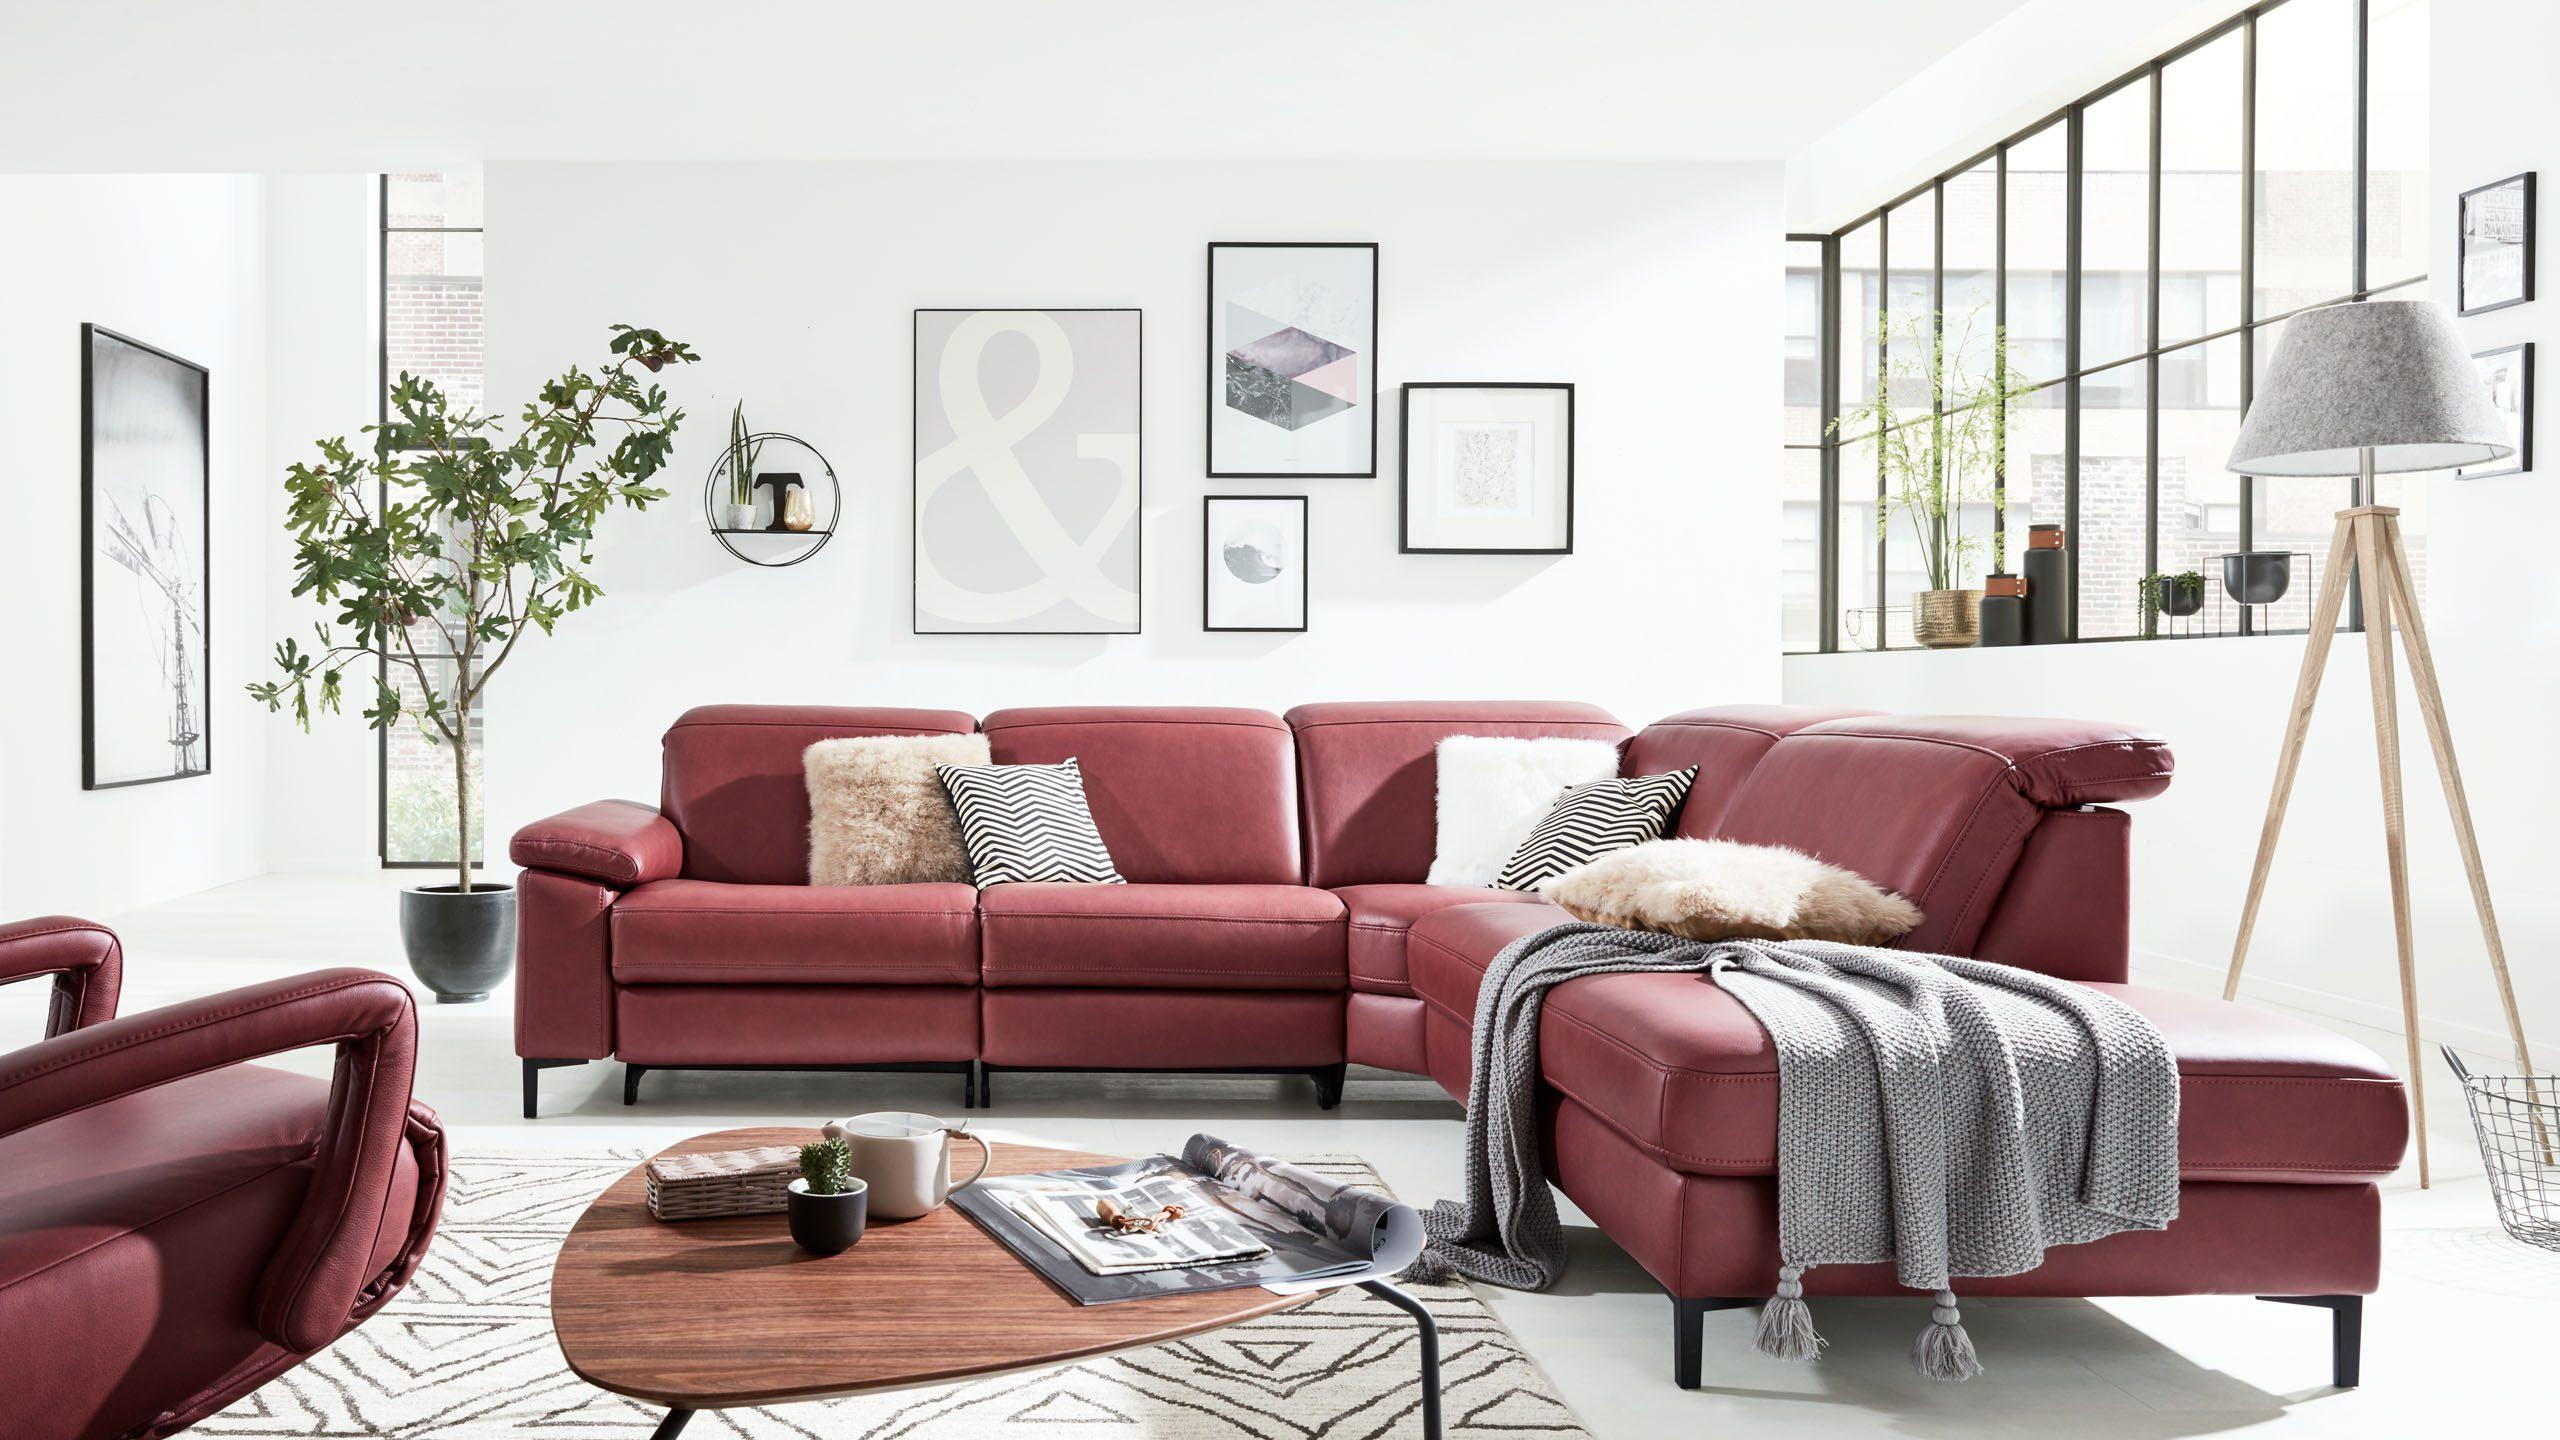 Interliving Sofa Serie 4054 in barolo rot - Variantenvielfalt